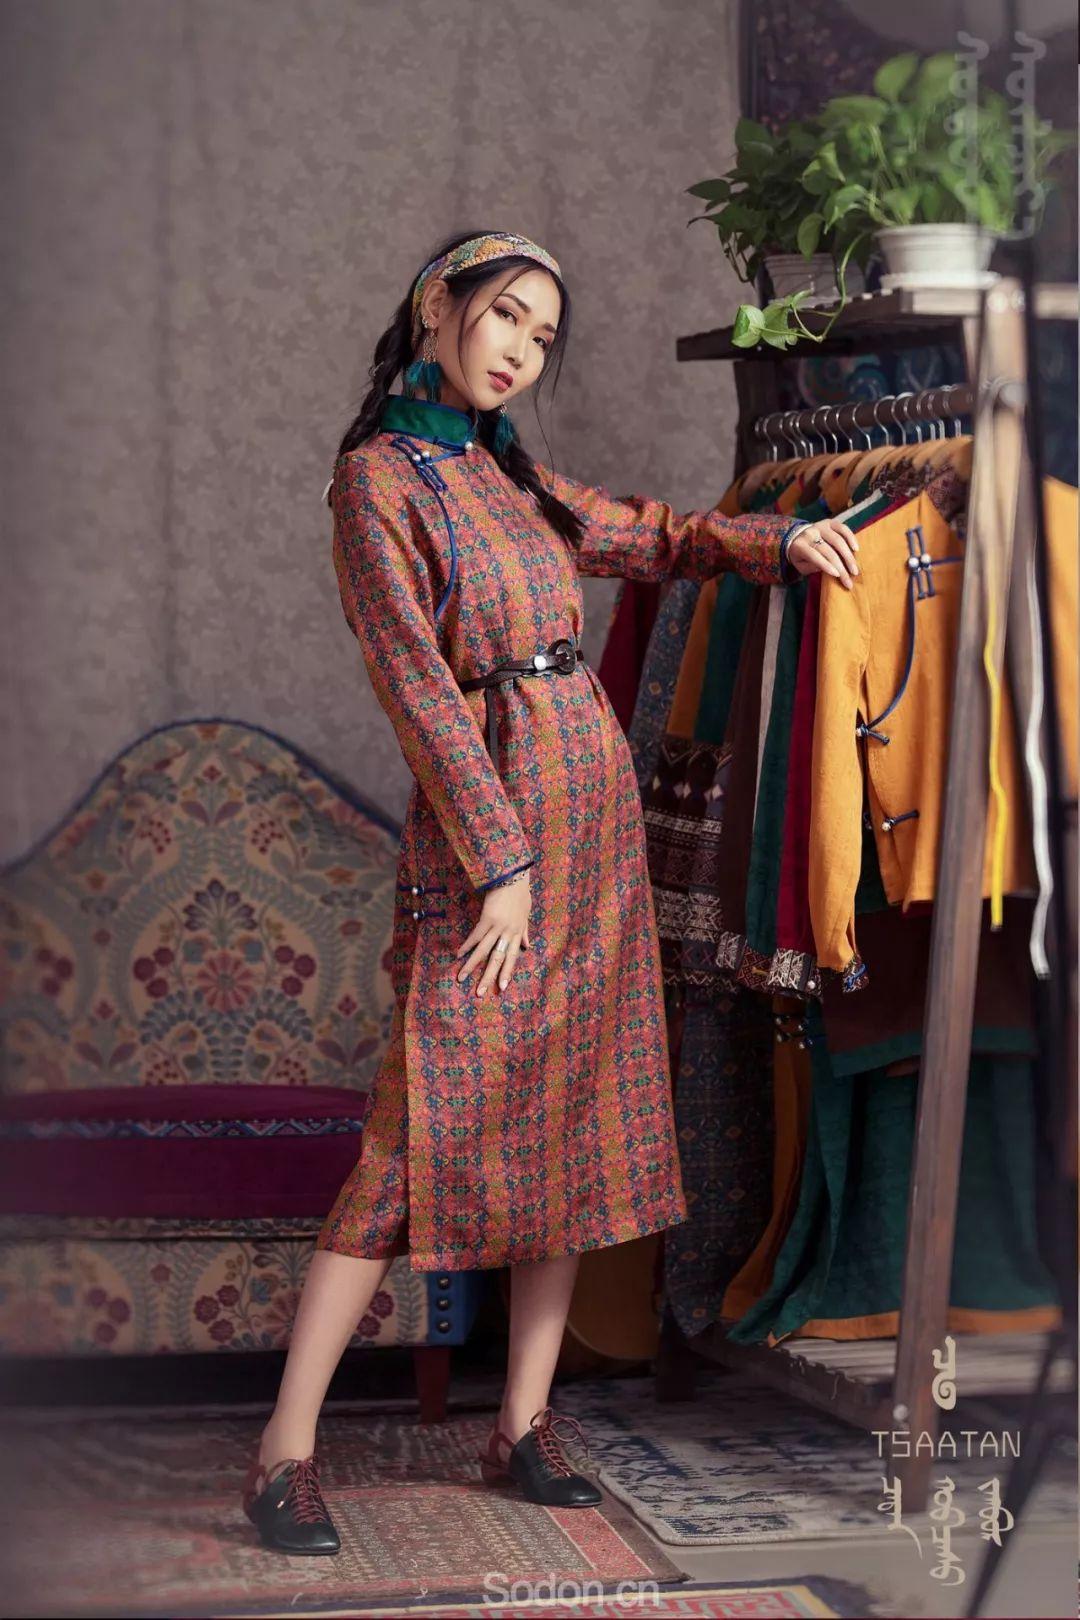 TSAATAN蒙古时装 2019夏季新款首发 第28张